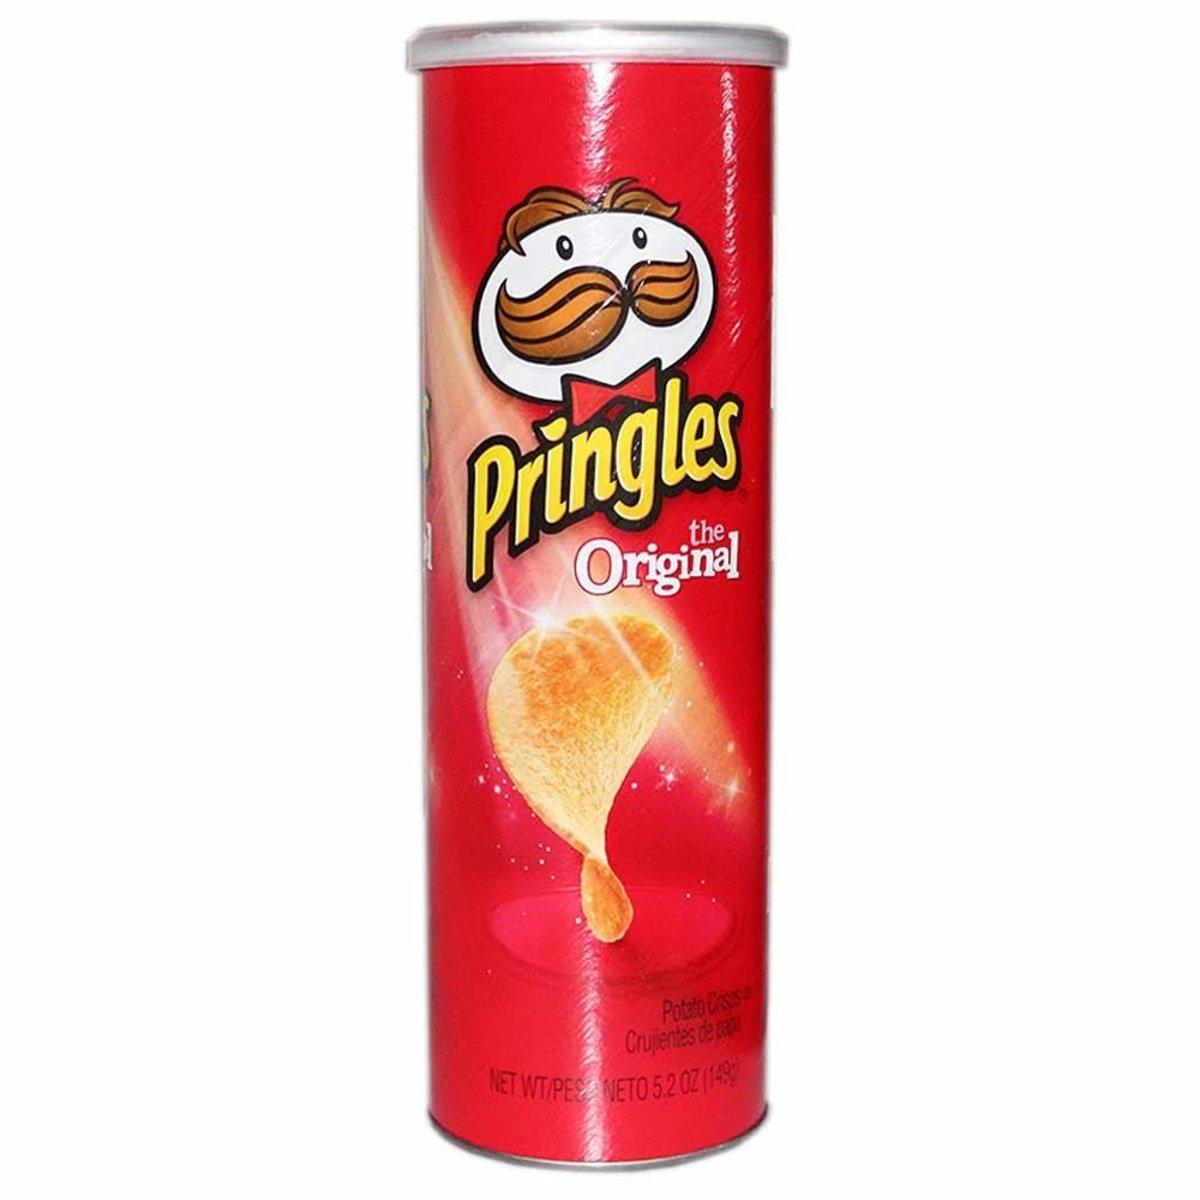 Pringles 原味薯片 149g